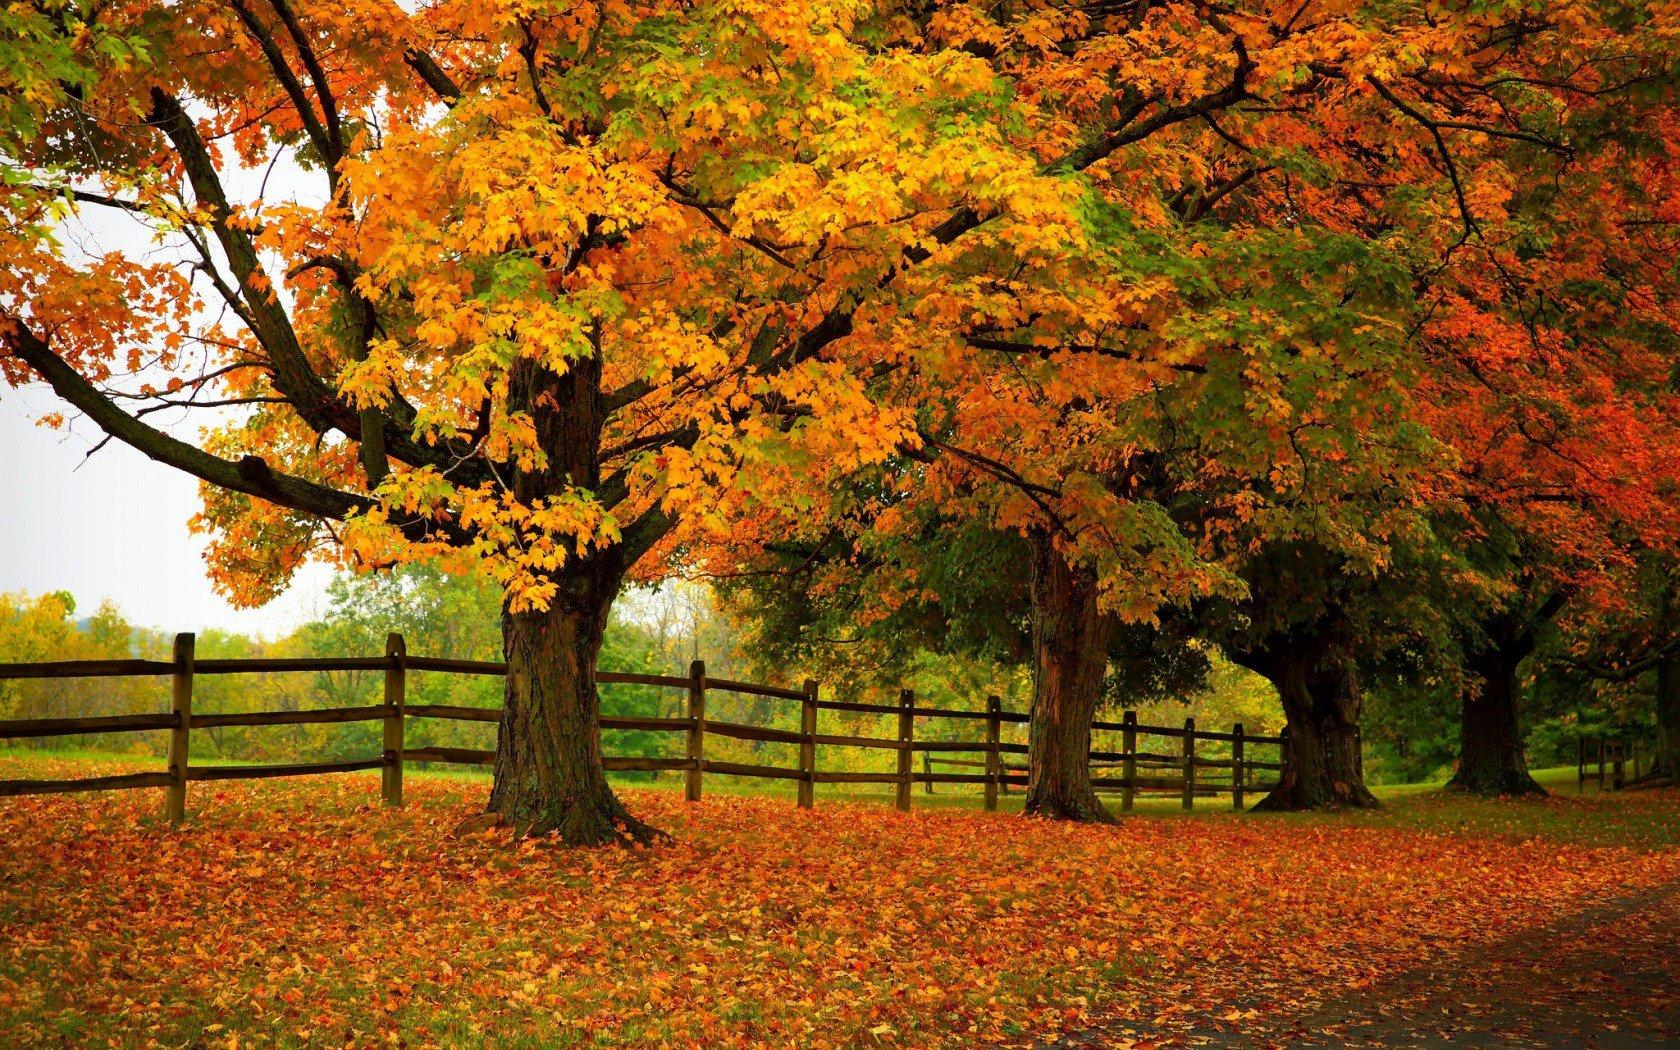 Autumn Trees Forest Park 4K Ultra Hd Wallpaper   HD Wallpapers 1680x1050